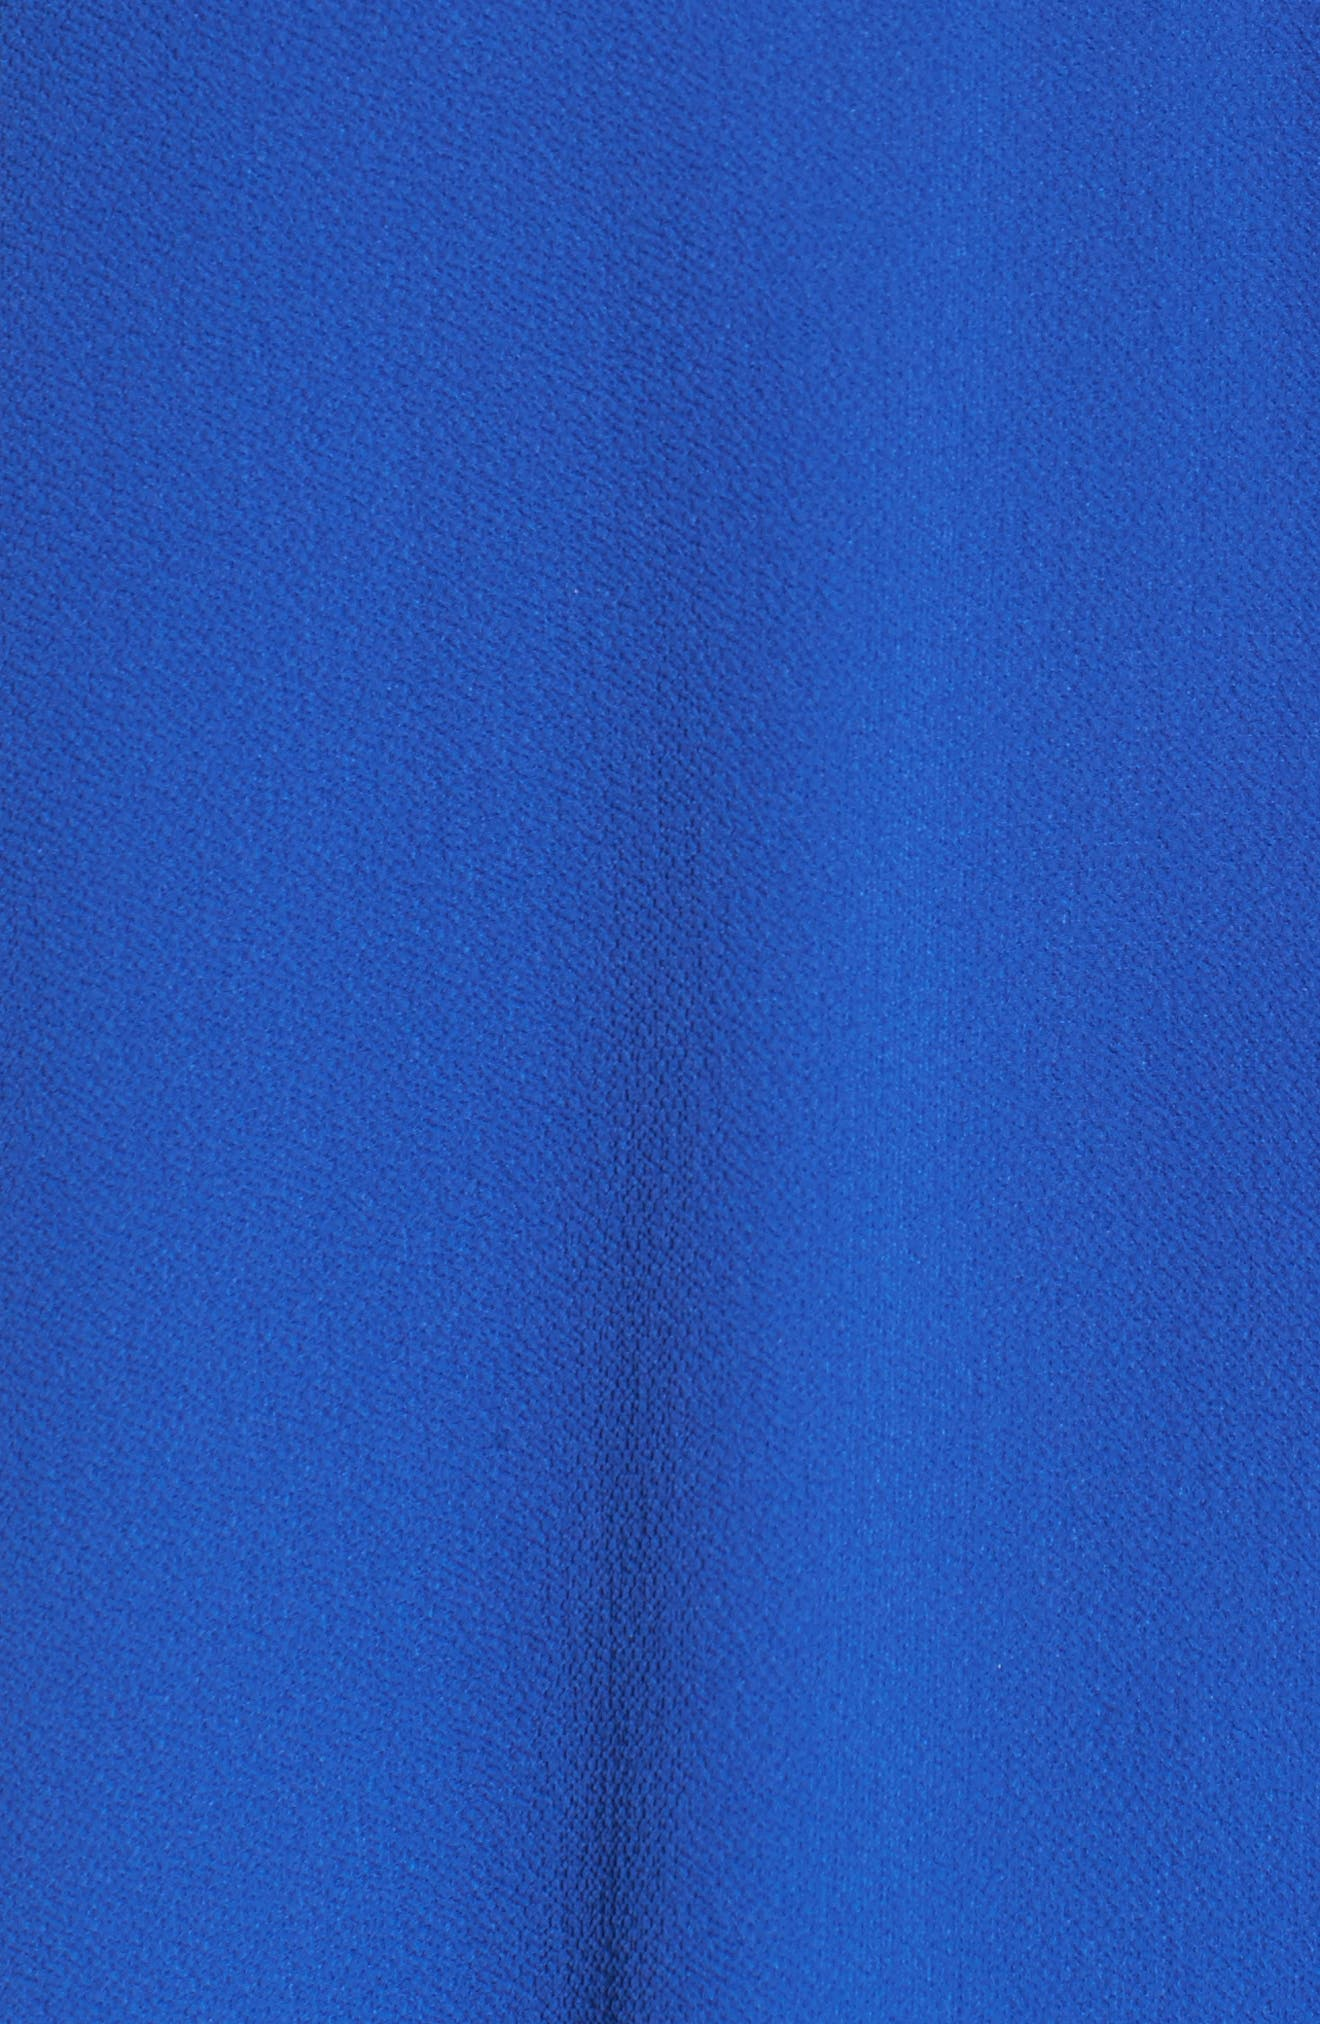 Lace Yoke Pleated Back Top,                             Alternate thumbnail 5, color,                             403